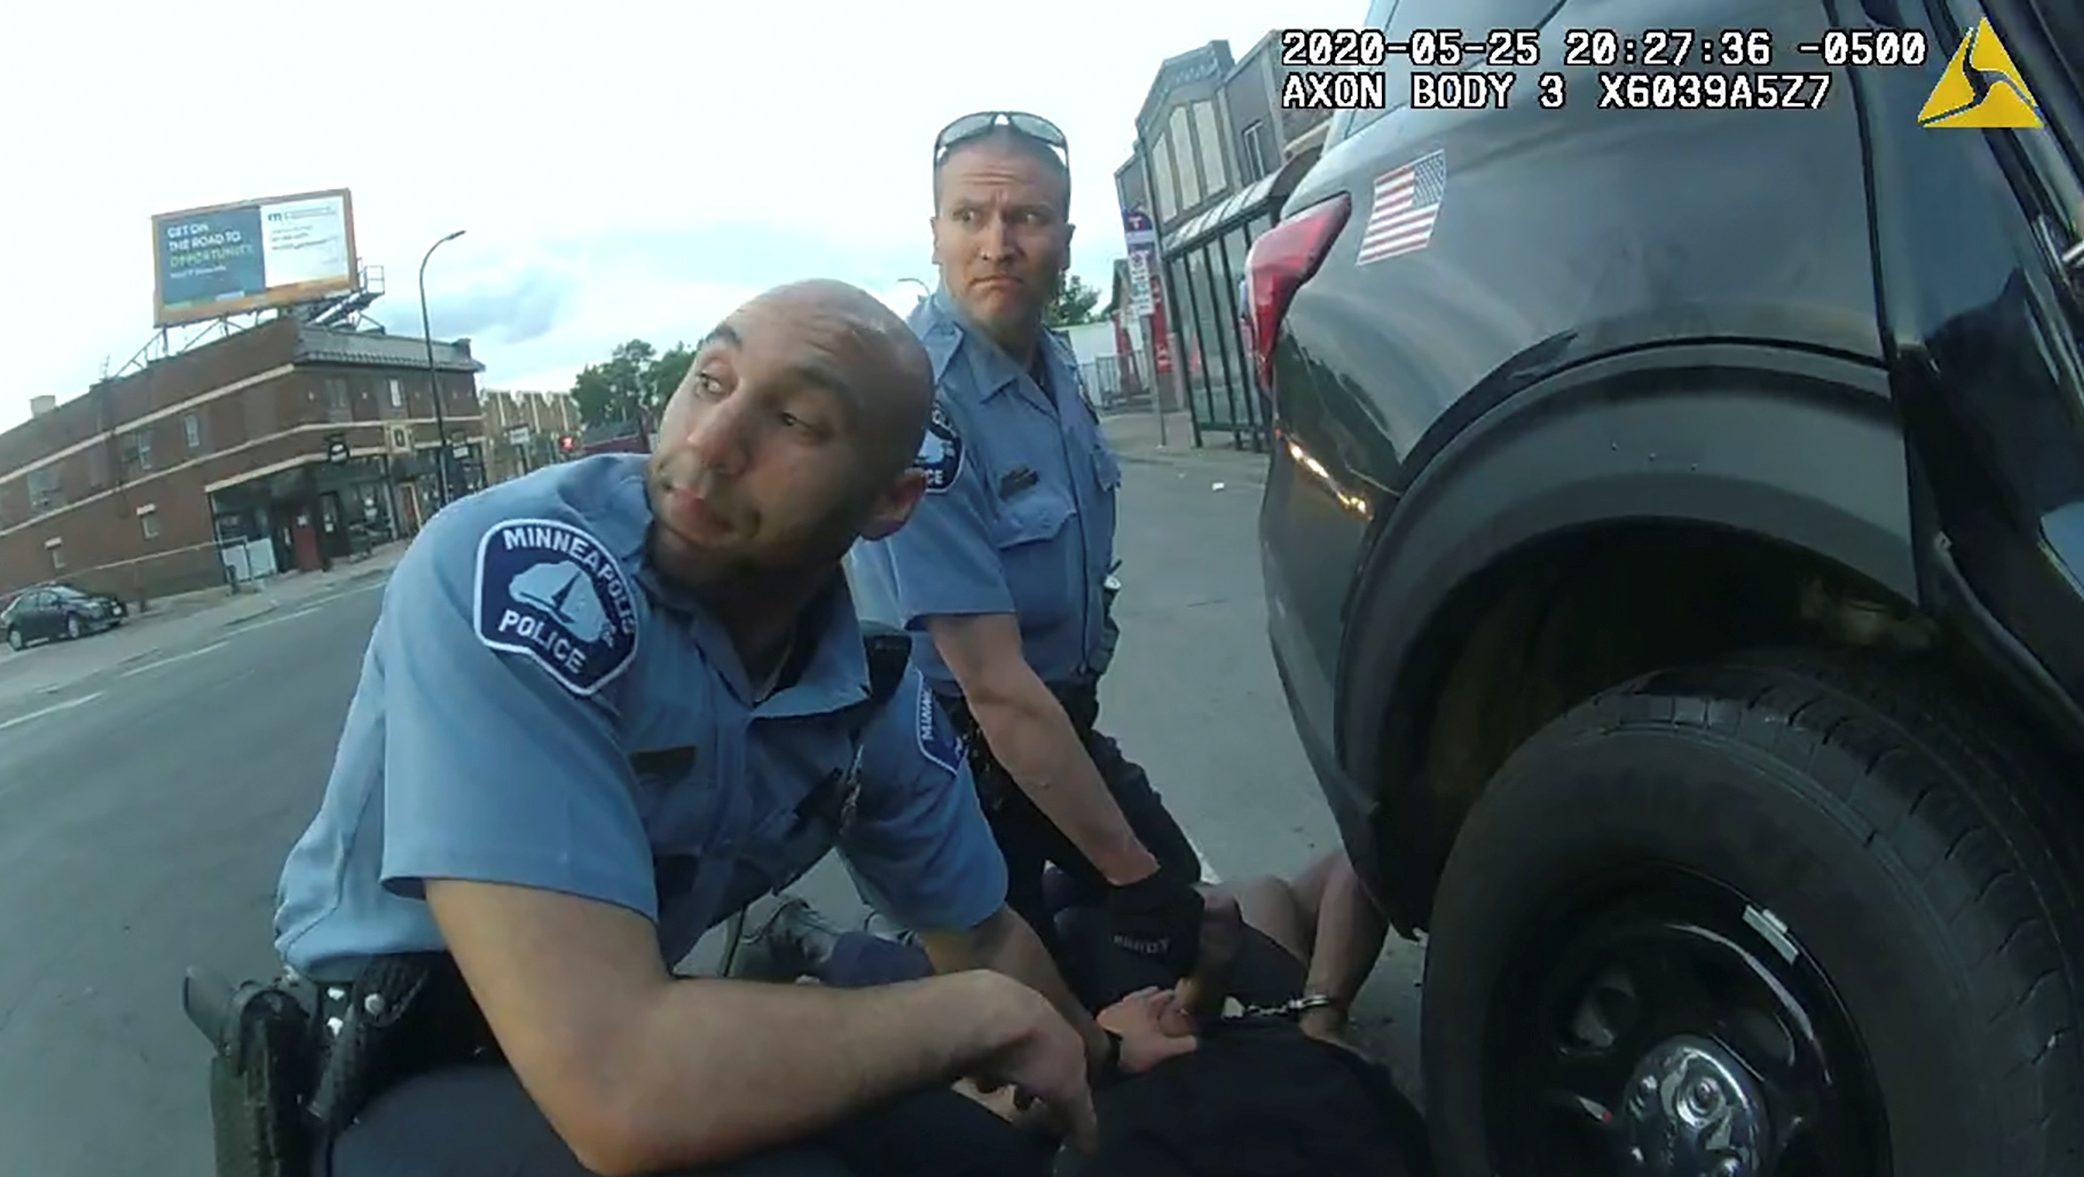 Police body camera footage of former Minneapolis police officer Derek Chauvin (L) kneeling on George Floyd